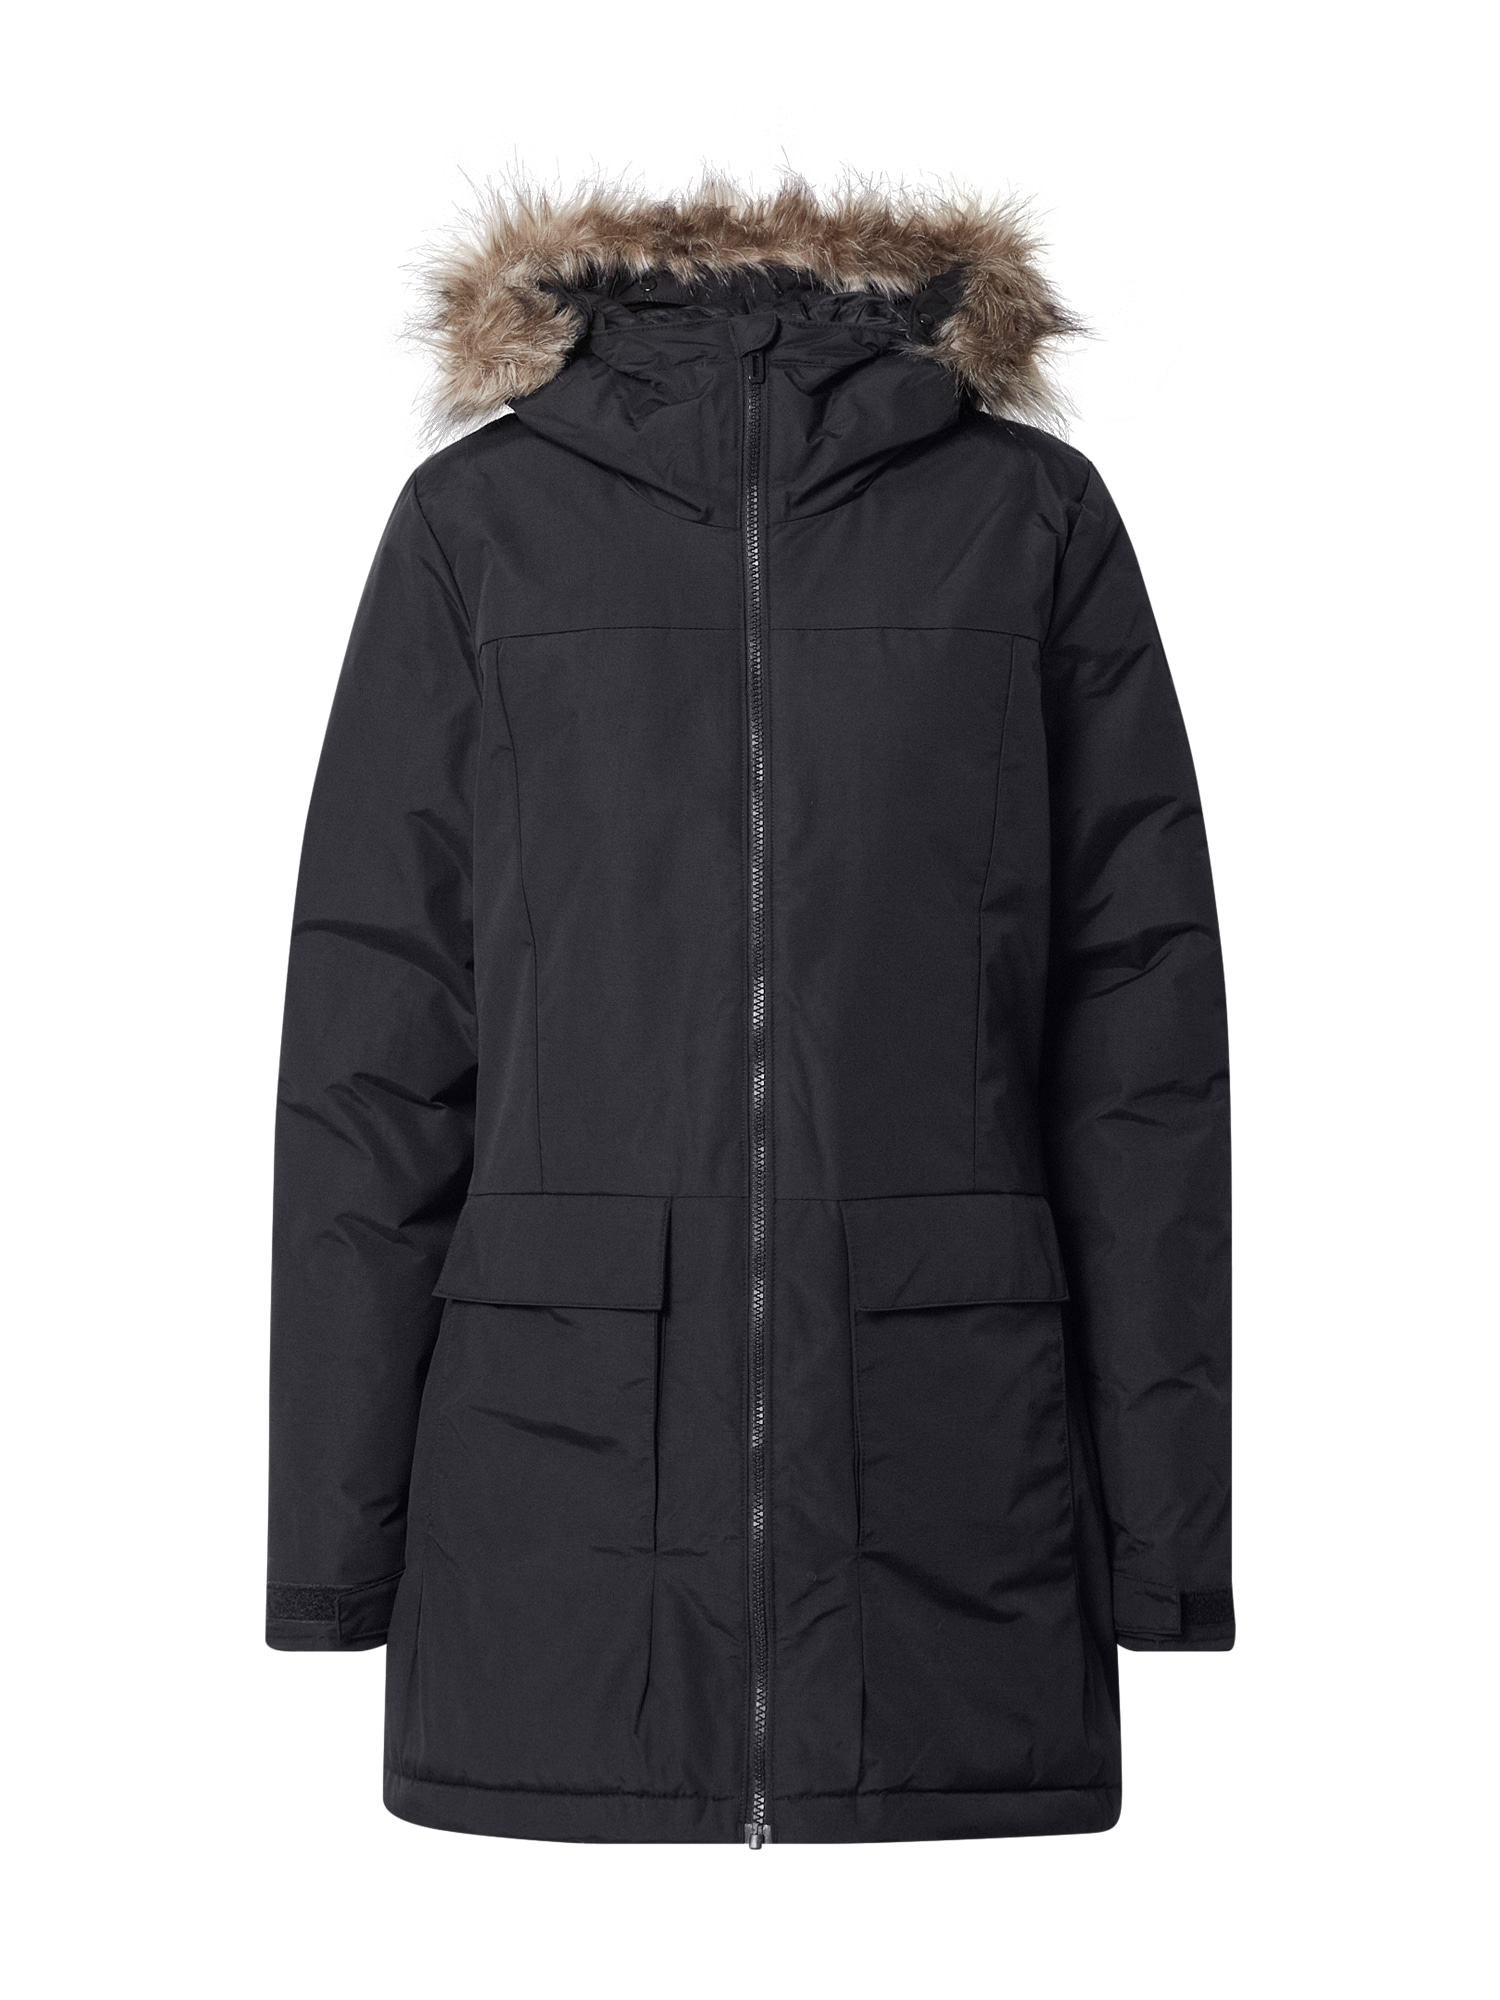 ADIDAS PERFORMANCE Outdoorová bunda 'Xploric'  černá